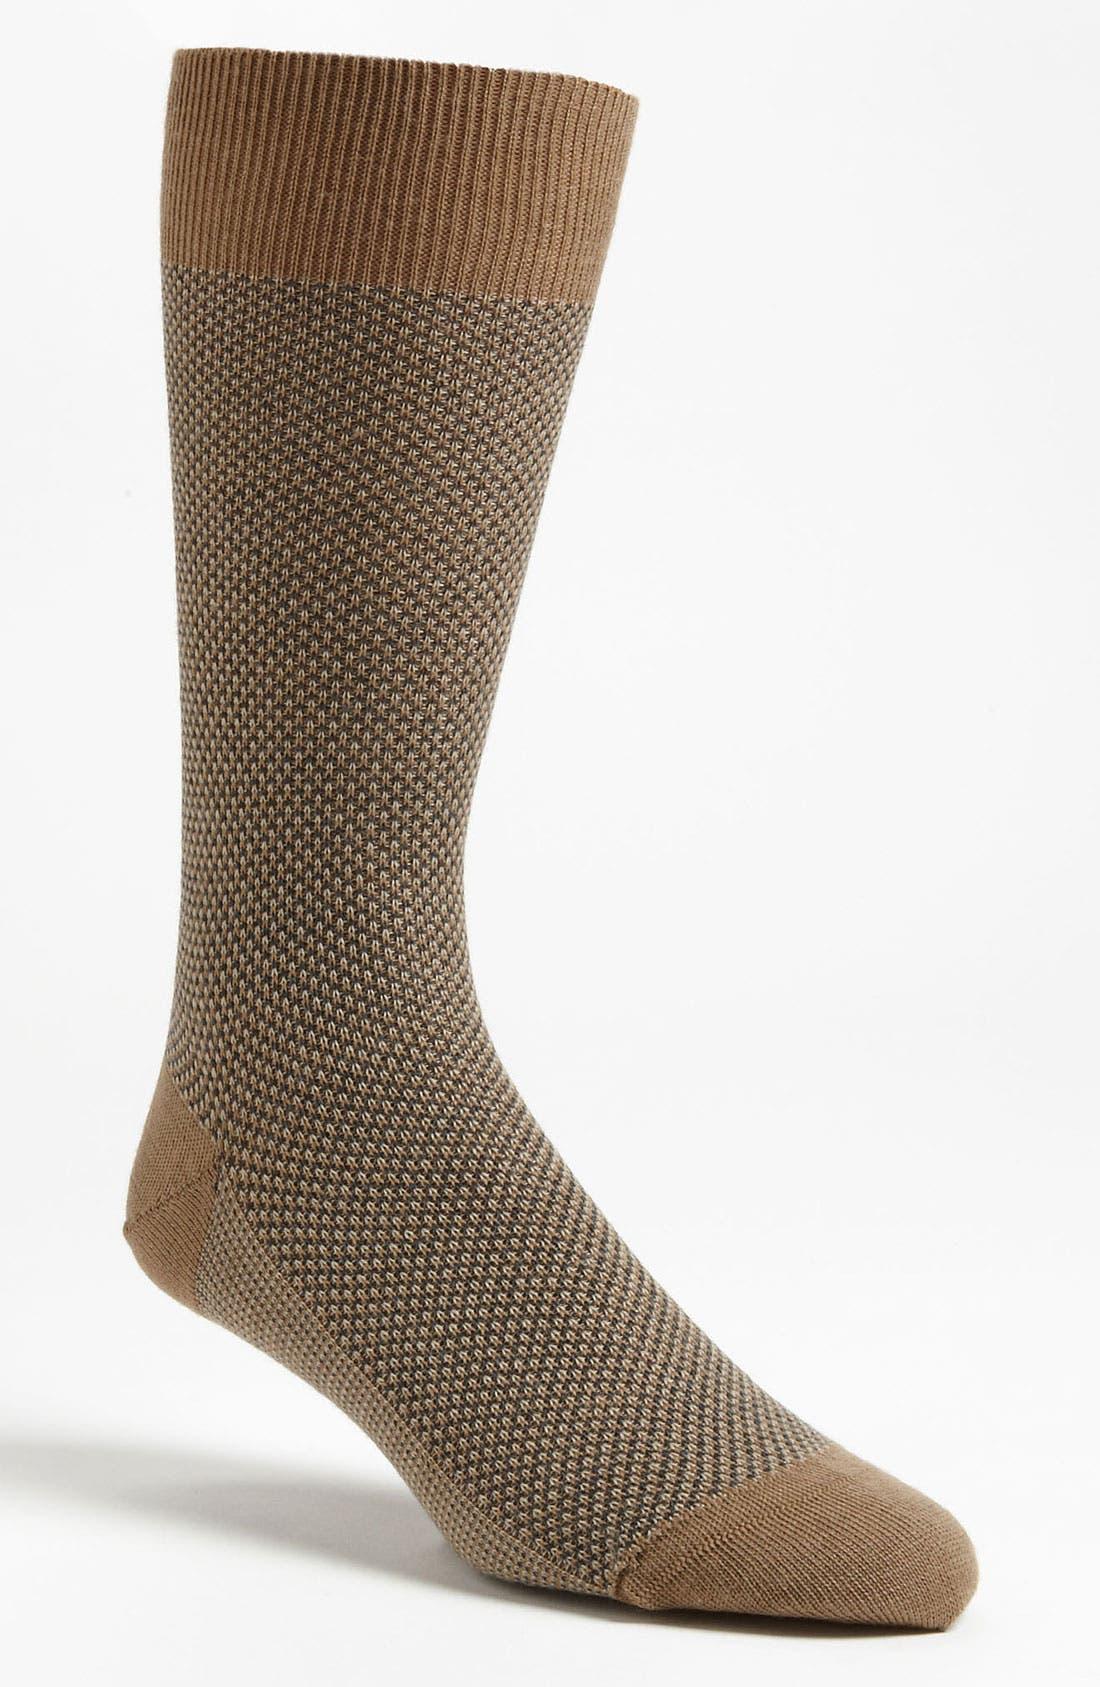 Alternate Image 1 Selected - Pantherella 'Vintage Collection' Birdseye Socks